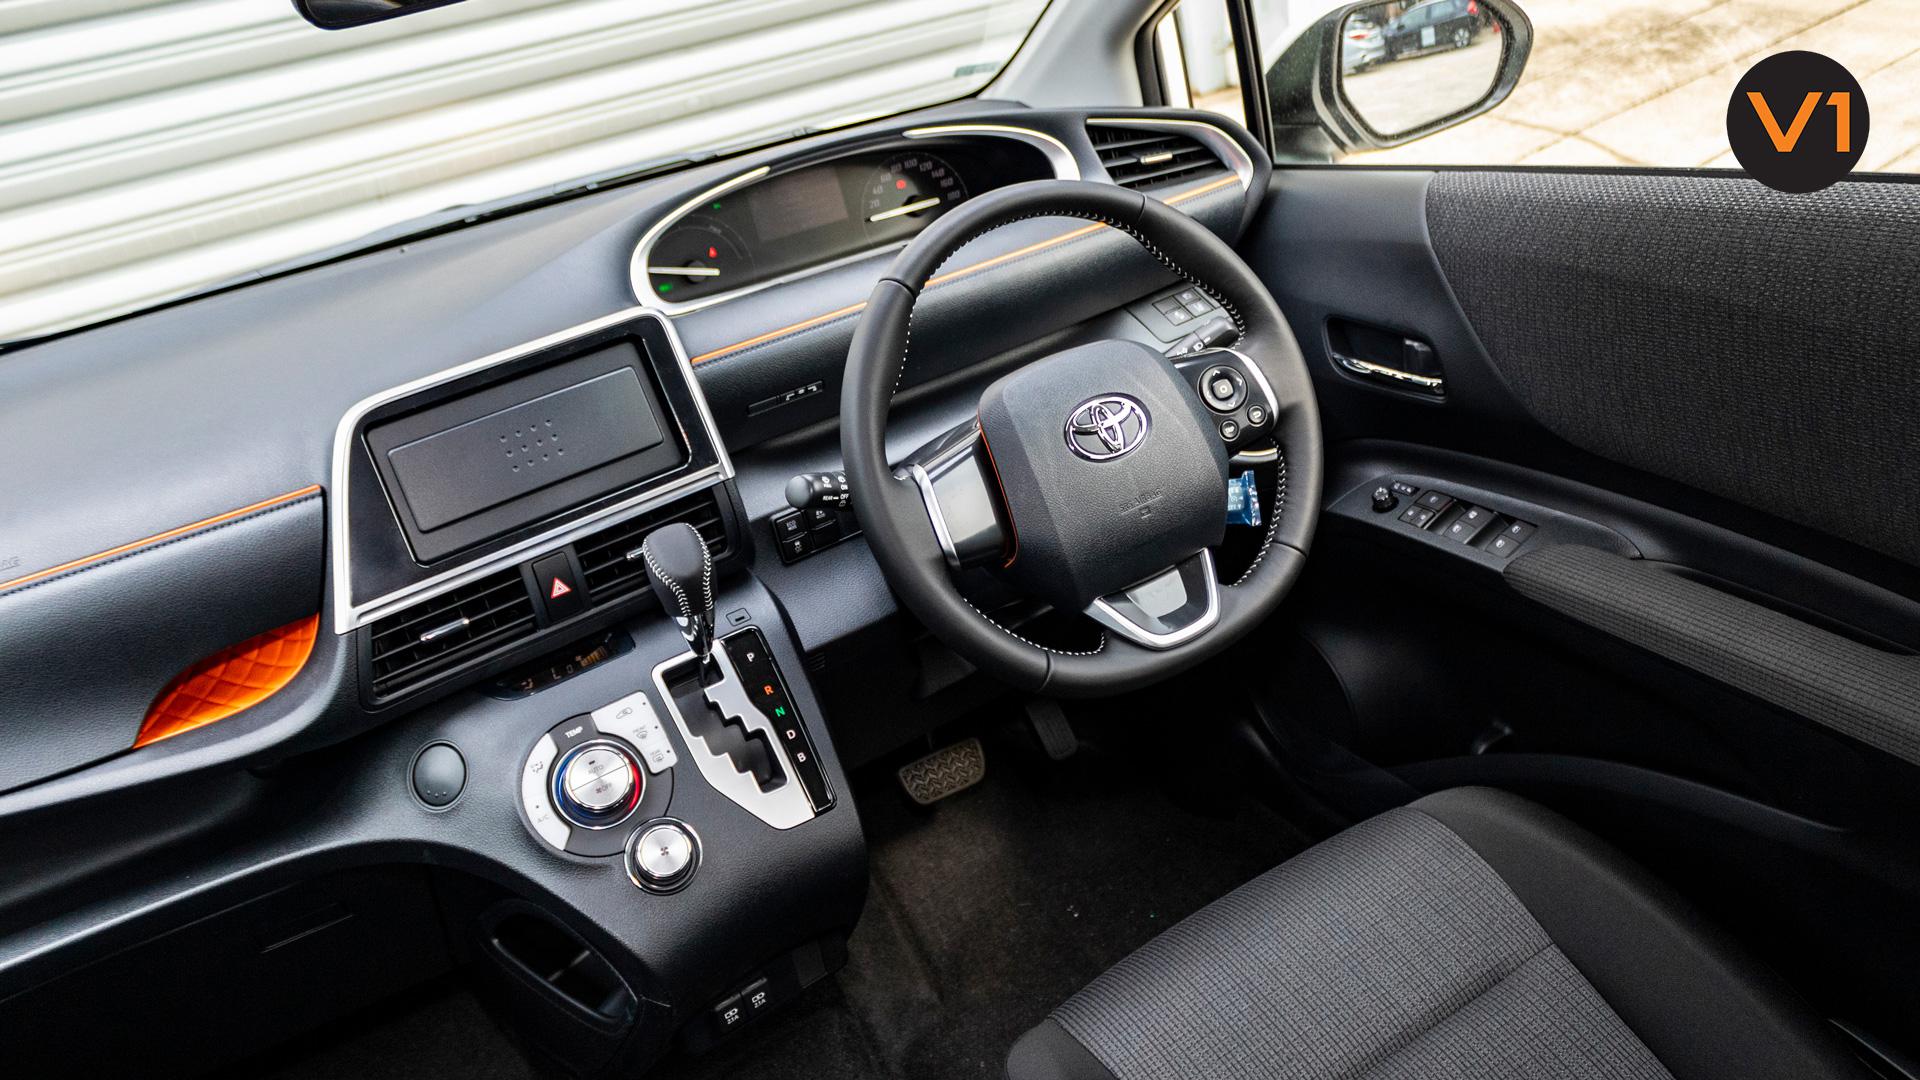 Toyota Sienta 1.5G Hybrid (New Facelift) - Center Console